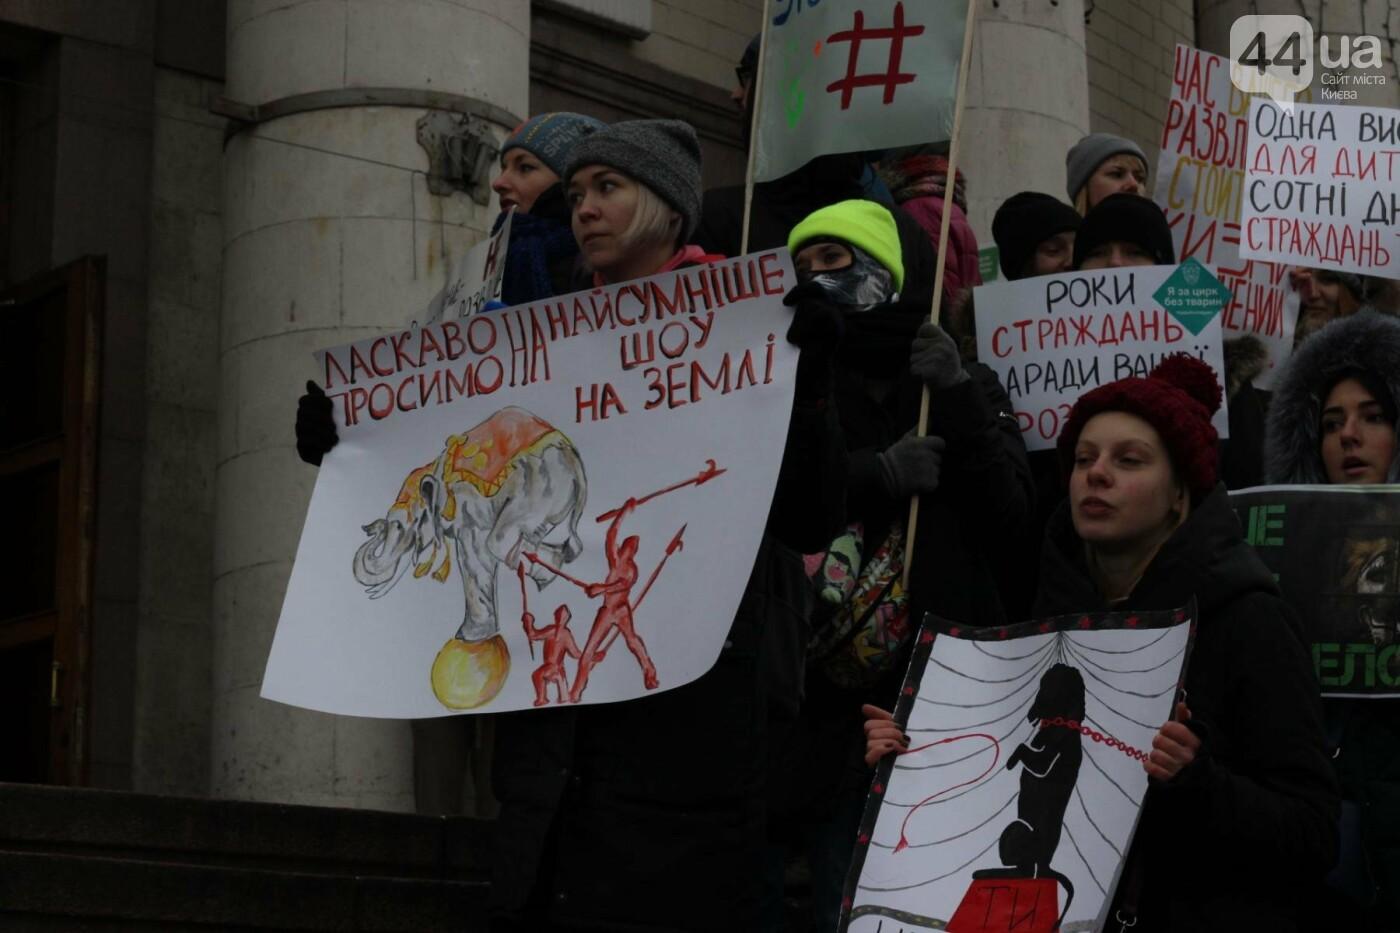 Цирк без животных: как в Киеве прошла акция протеста, фото-22